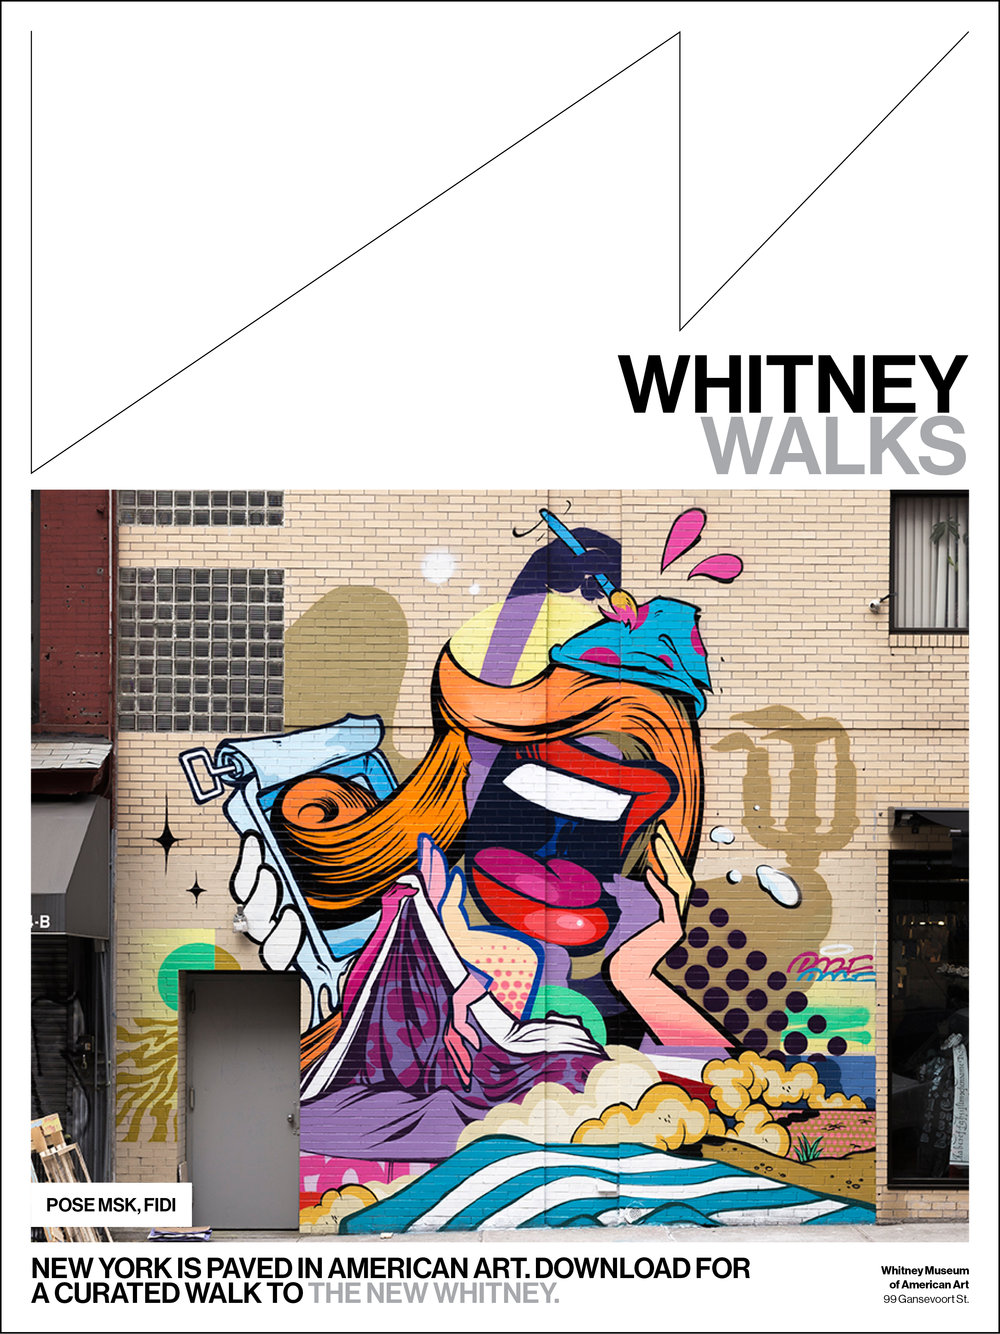 Whitney_WhitneyWalks_Print2-1.jpg